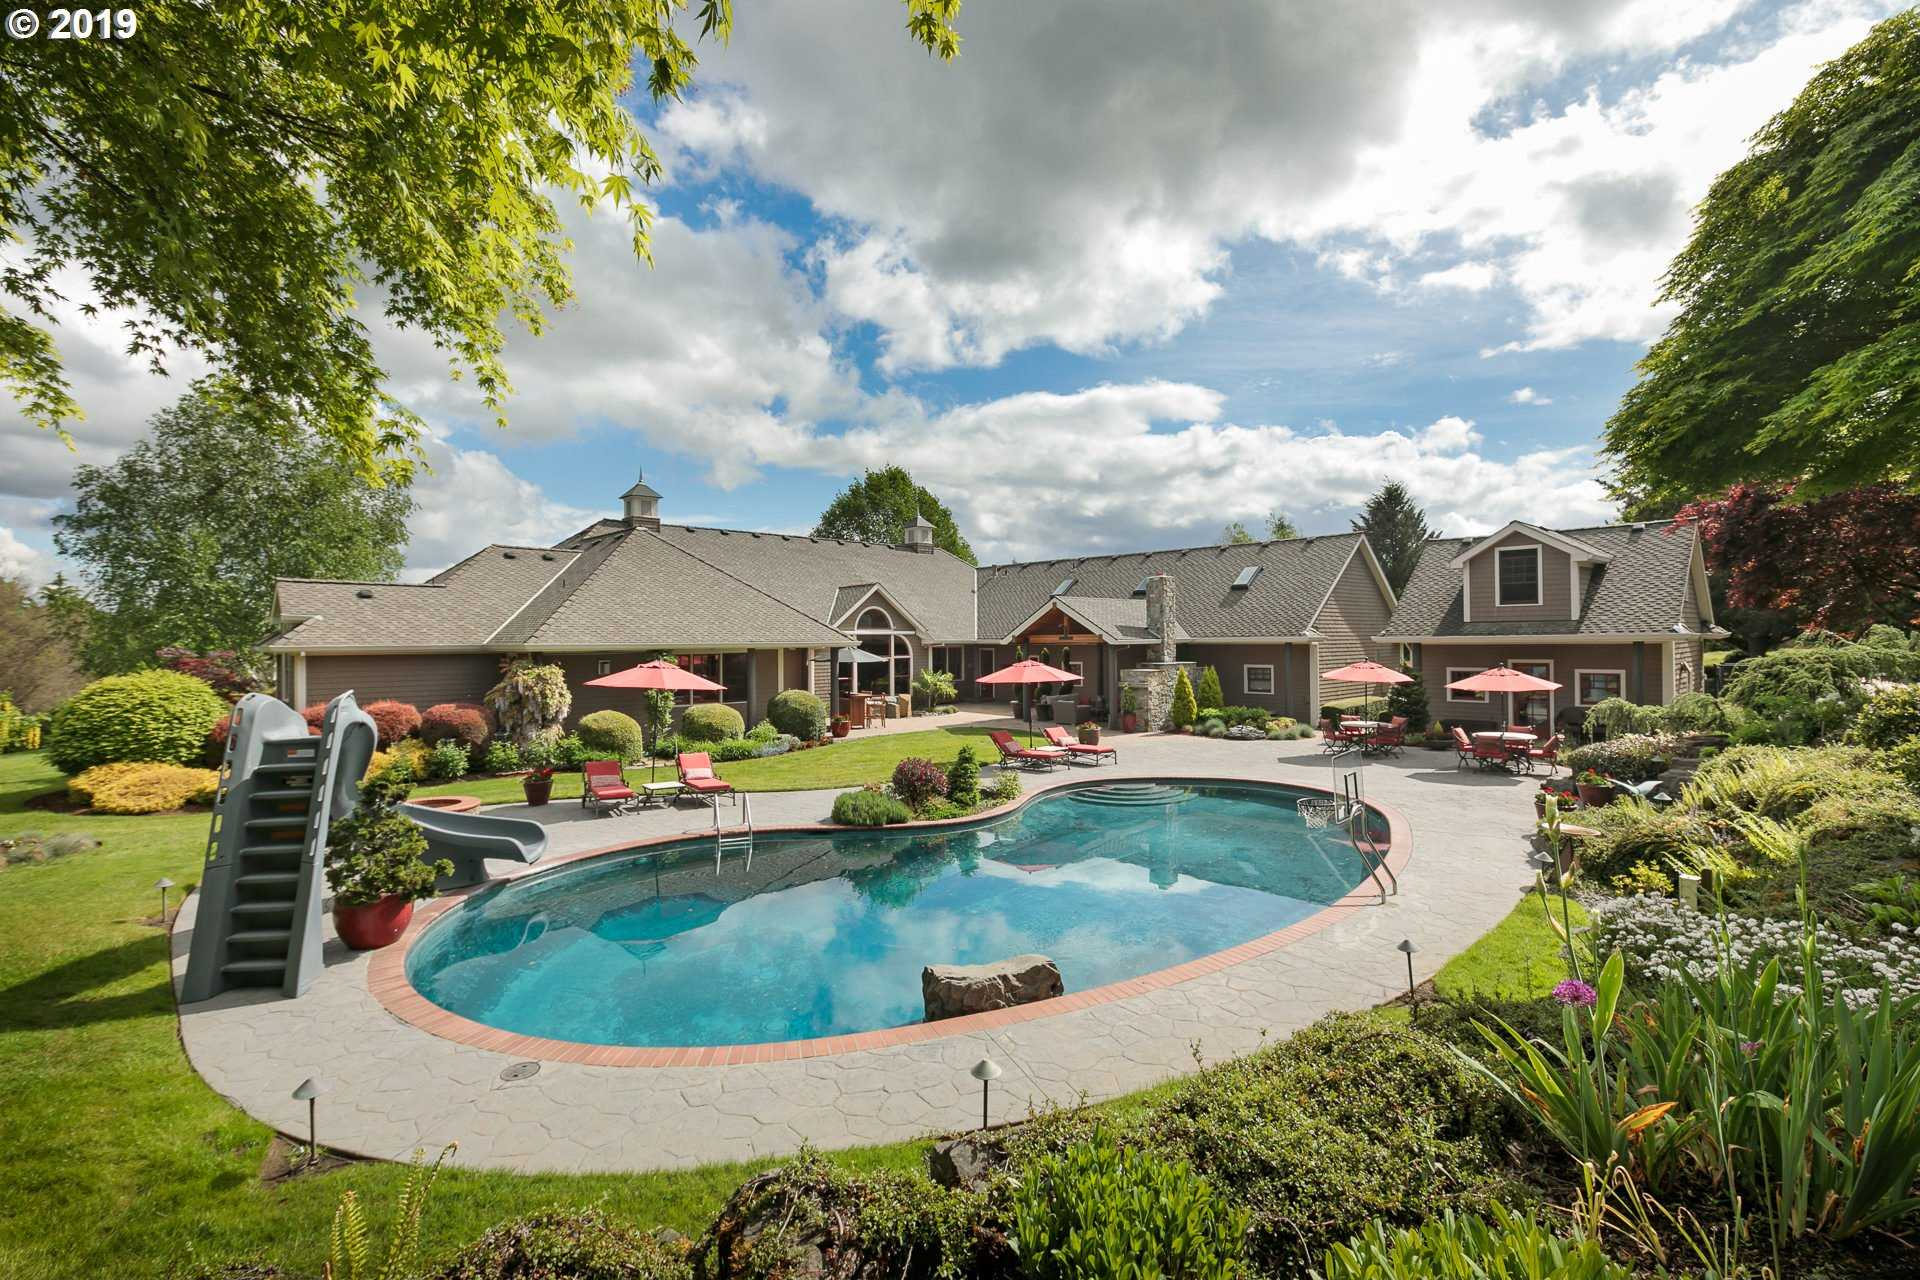 $2,347,000 - 4Br/6Ba -  for Sale in Stafford, Wilsonville